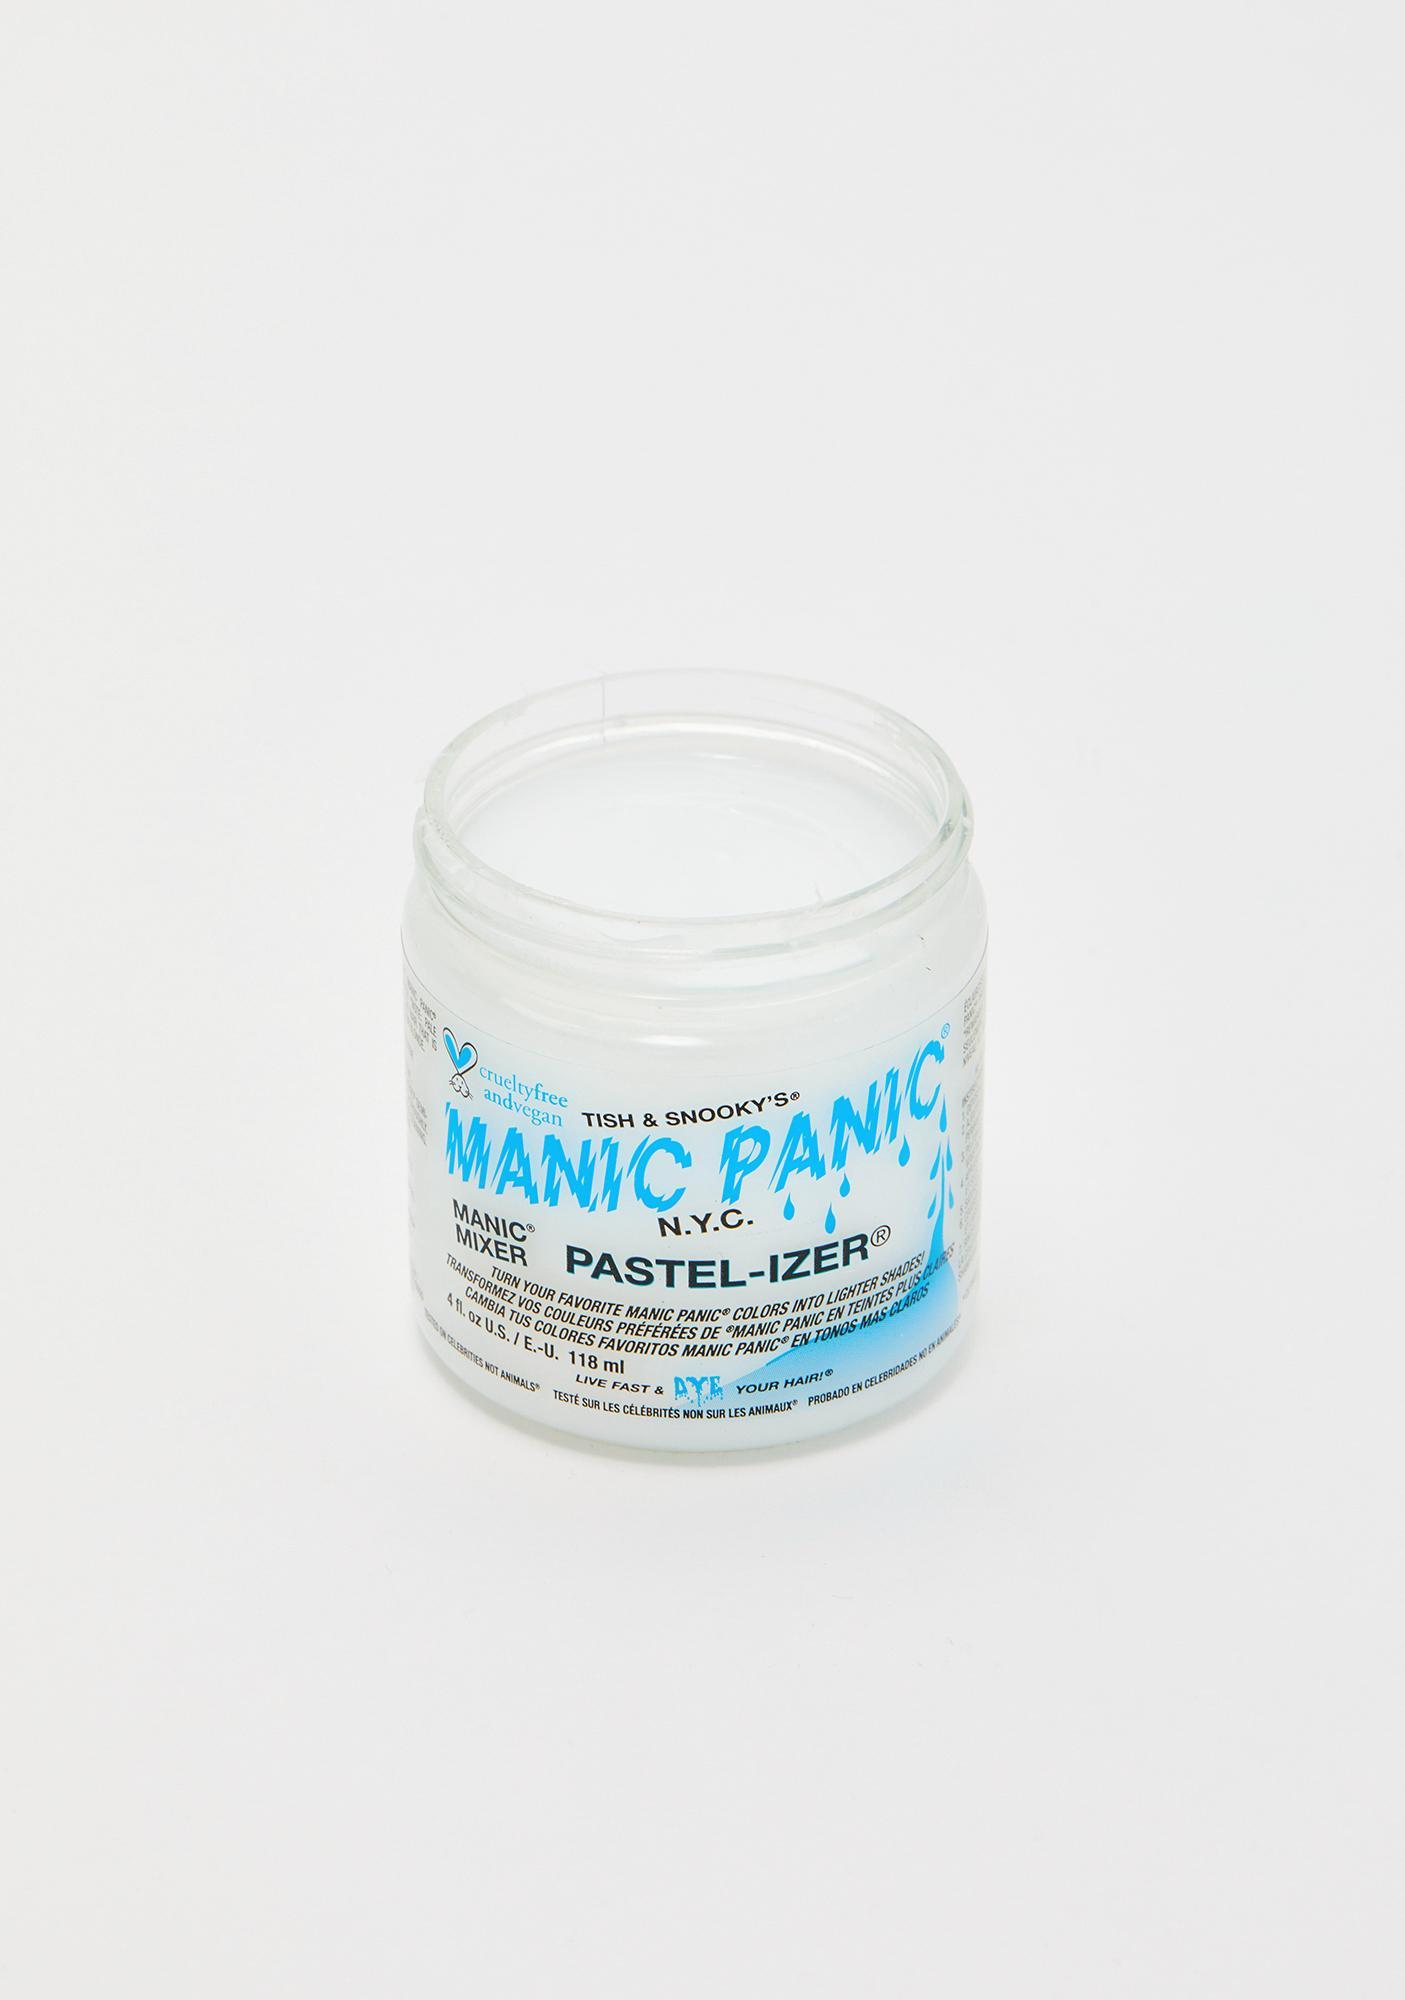 Manic Panic Manic Mixer Pastel-Izer